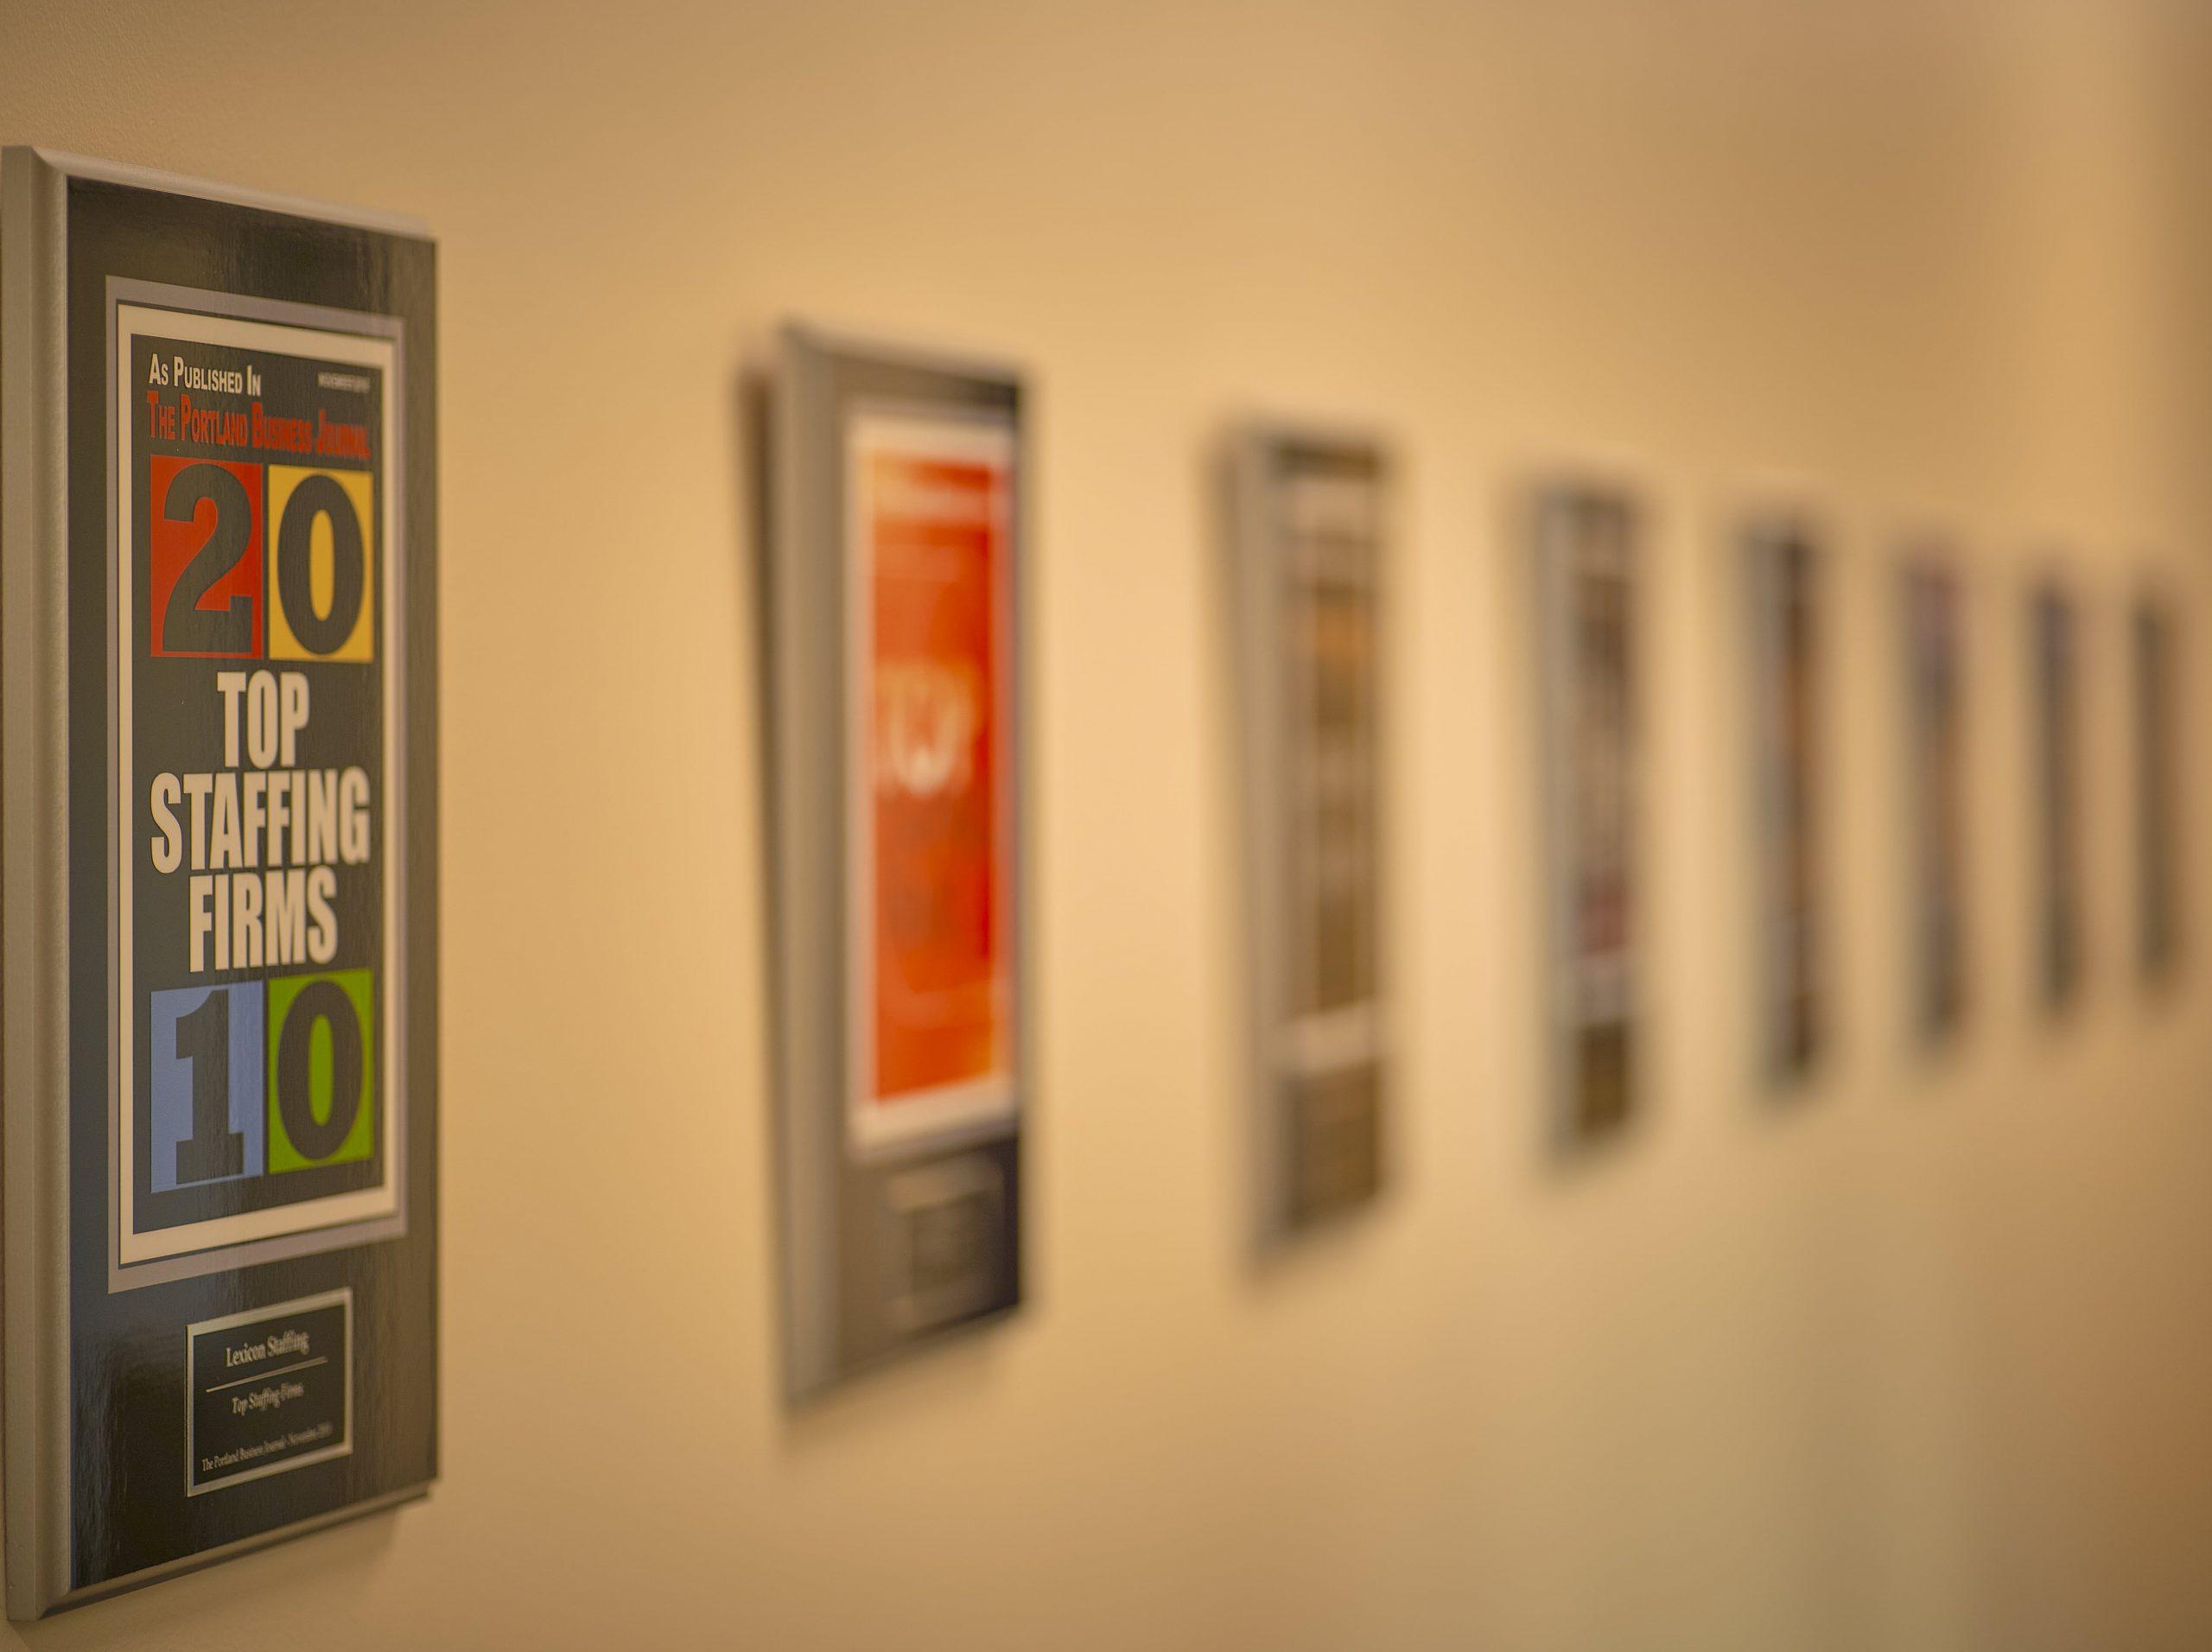 Wall of accolades.